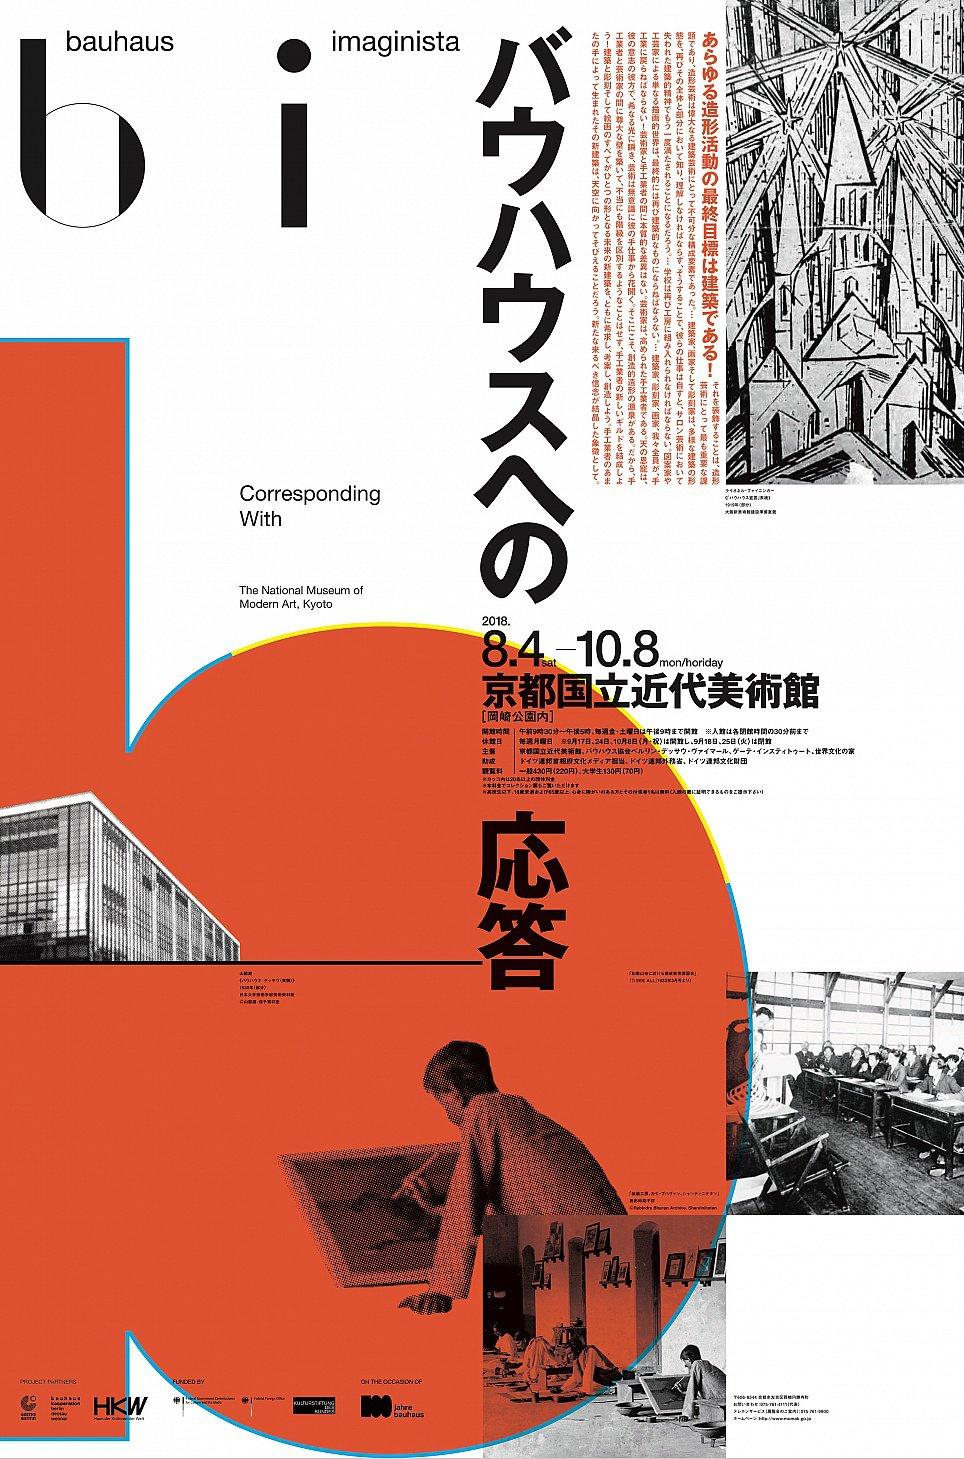 bauhaus imaginista: Corresponding With, Japan